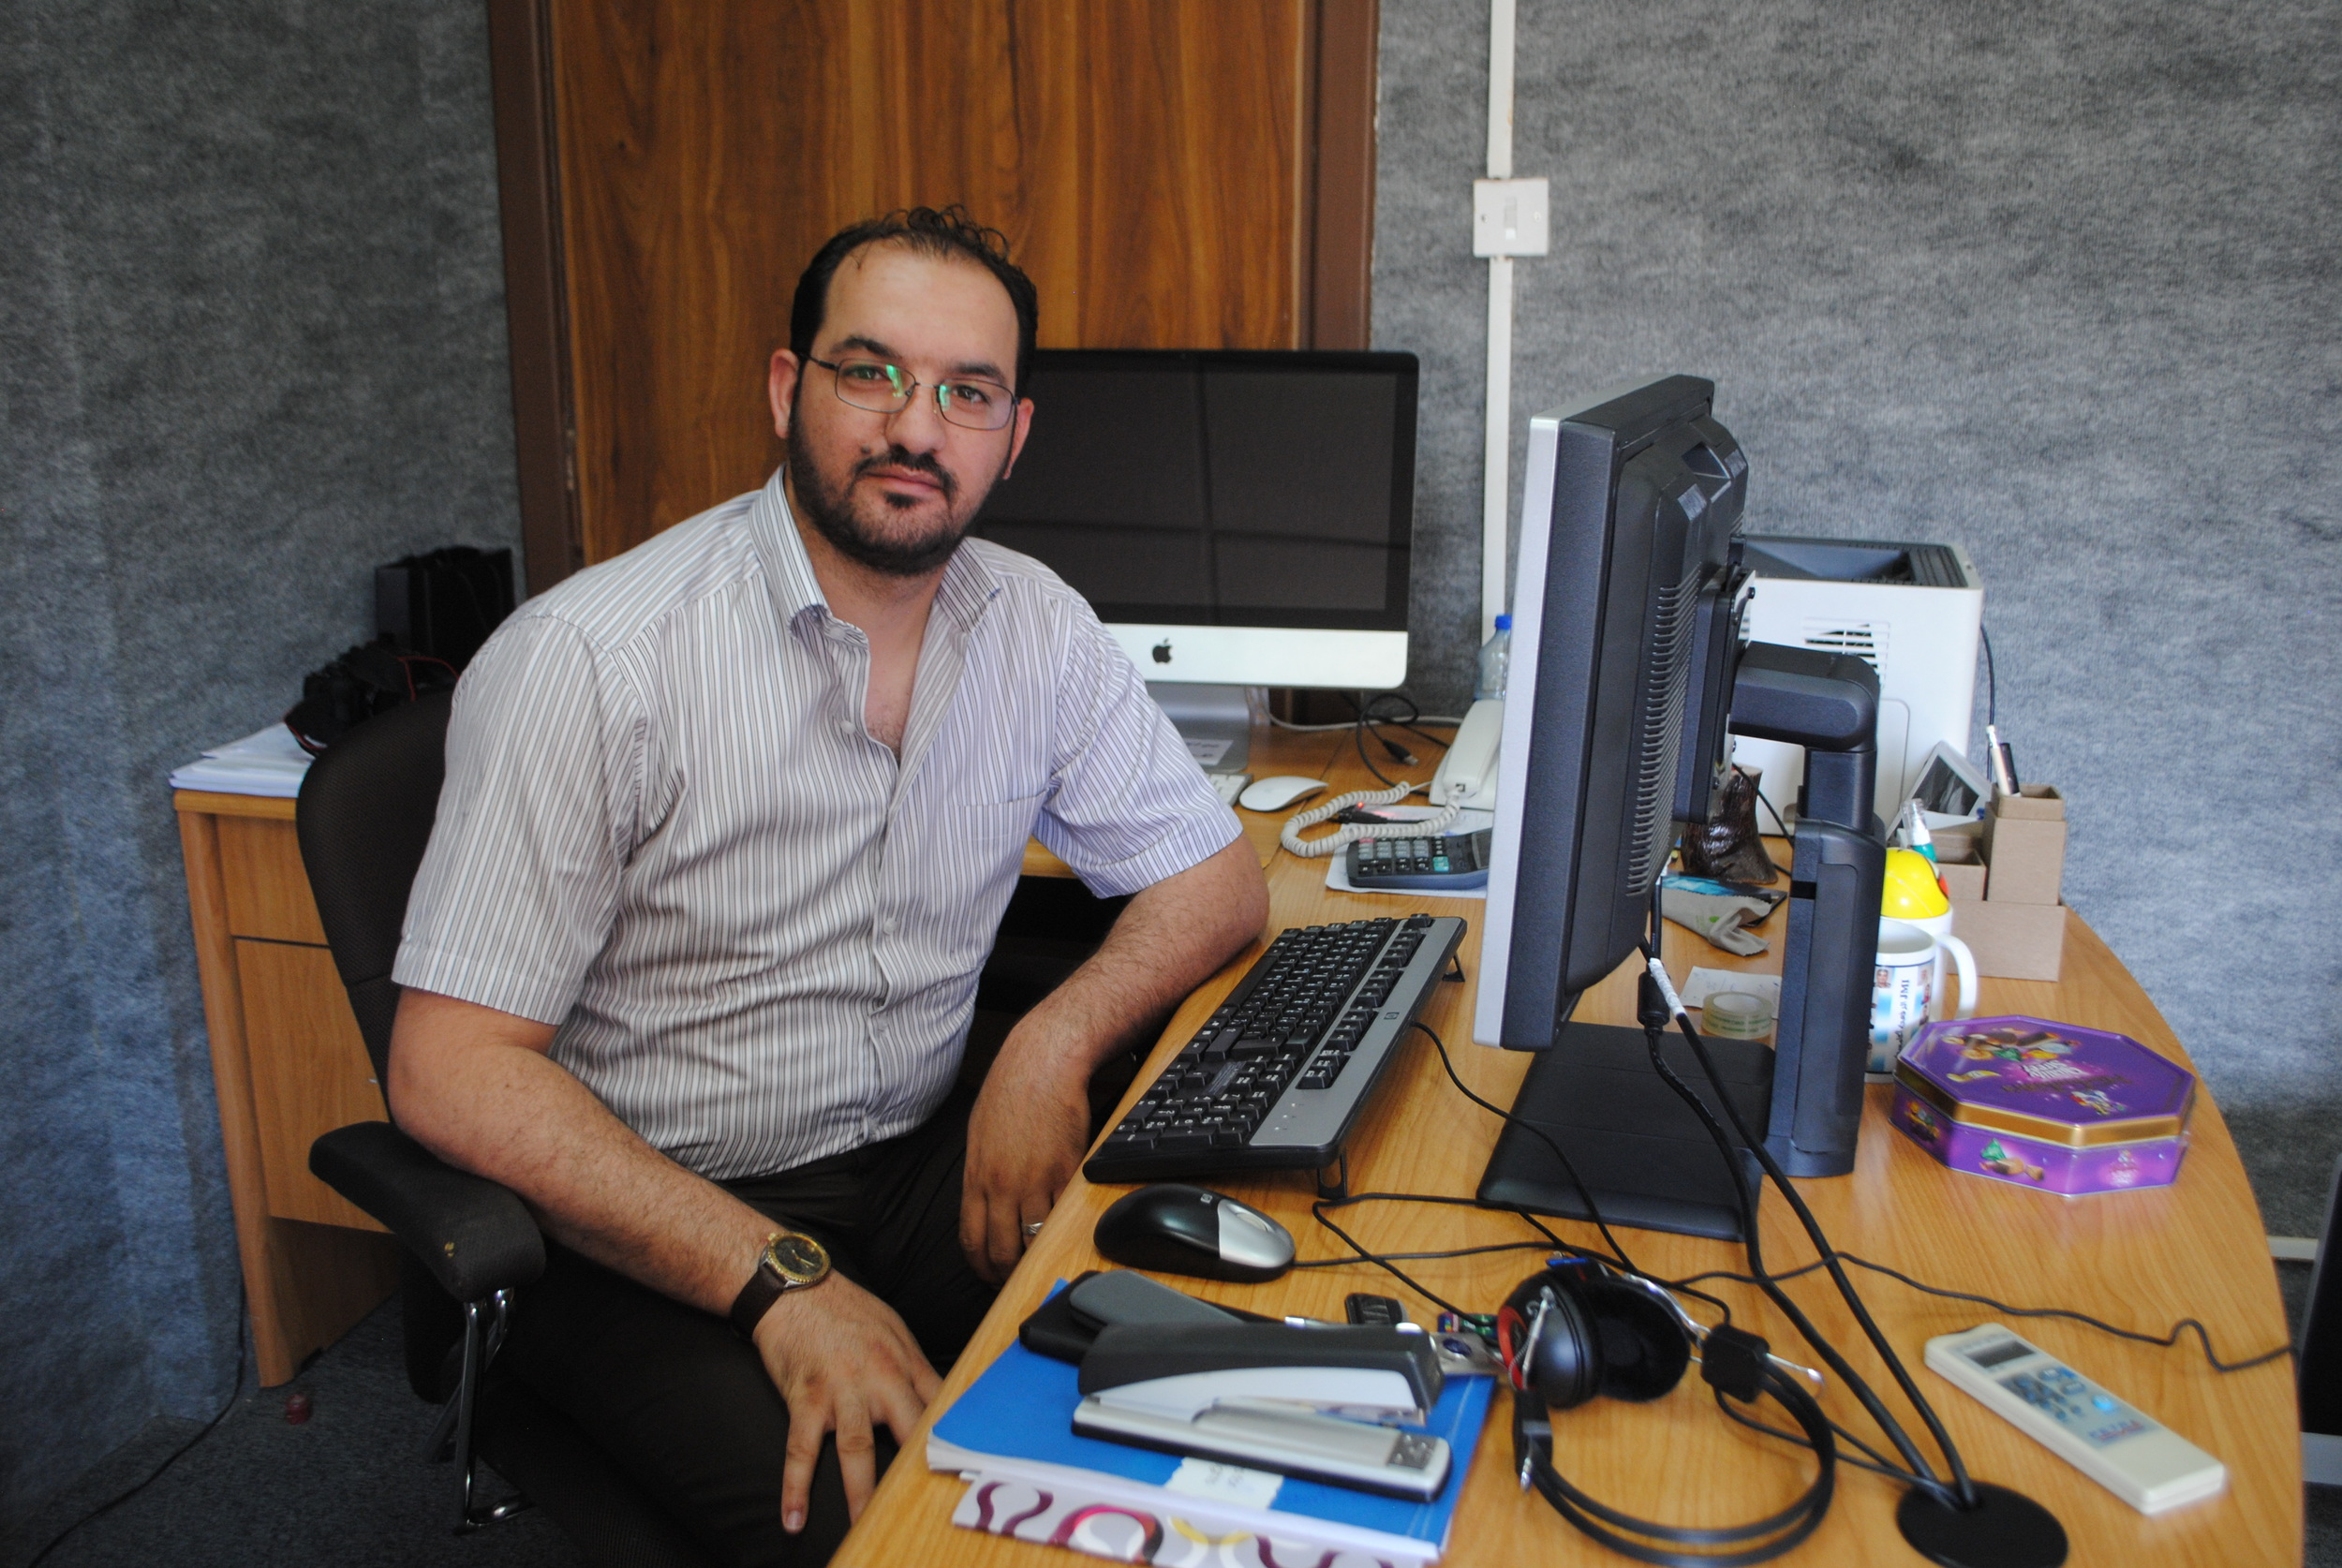 Abdullatif Najim. Photograpgh by StefaniaDi Paola